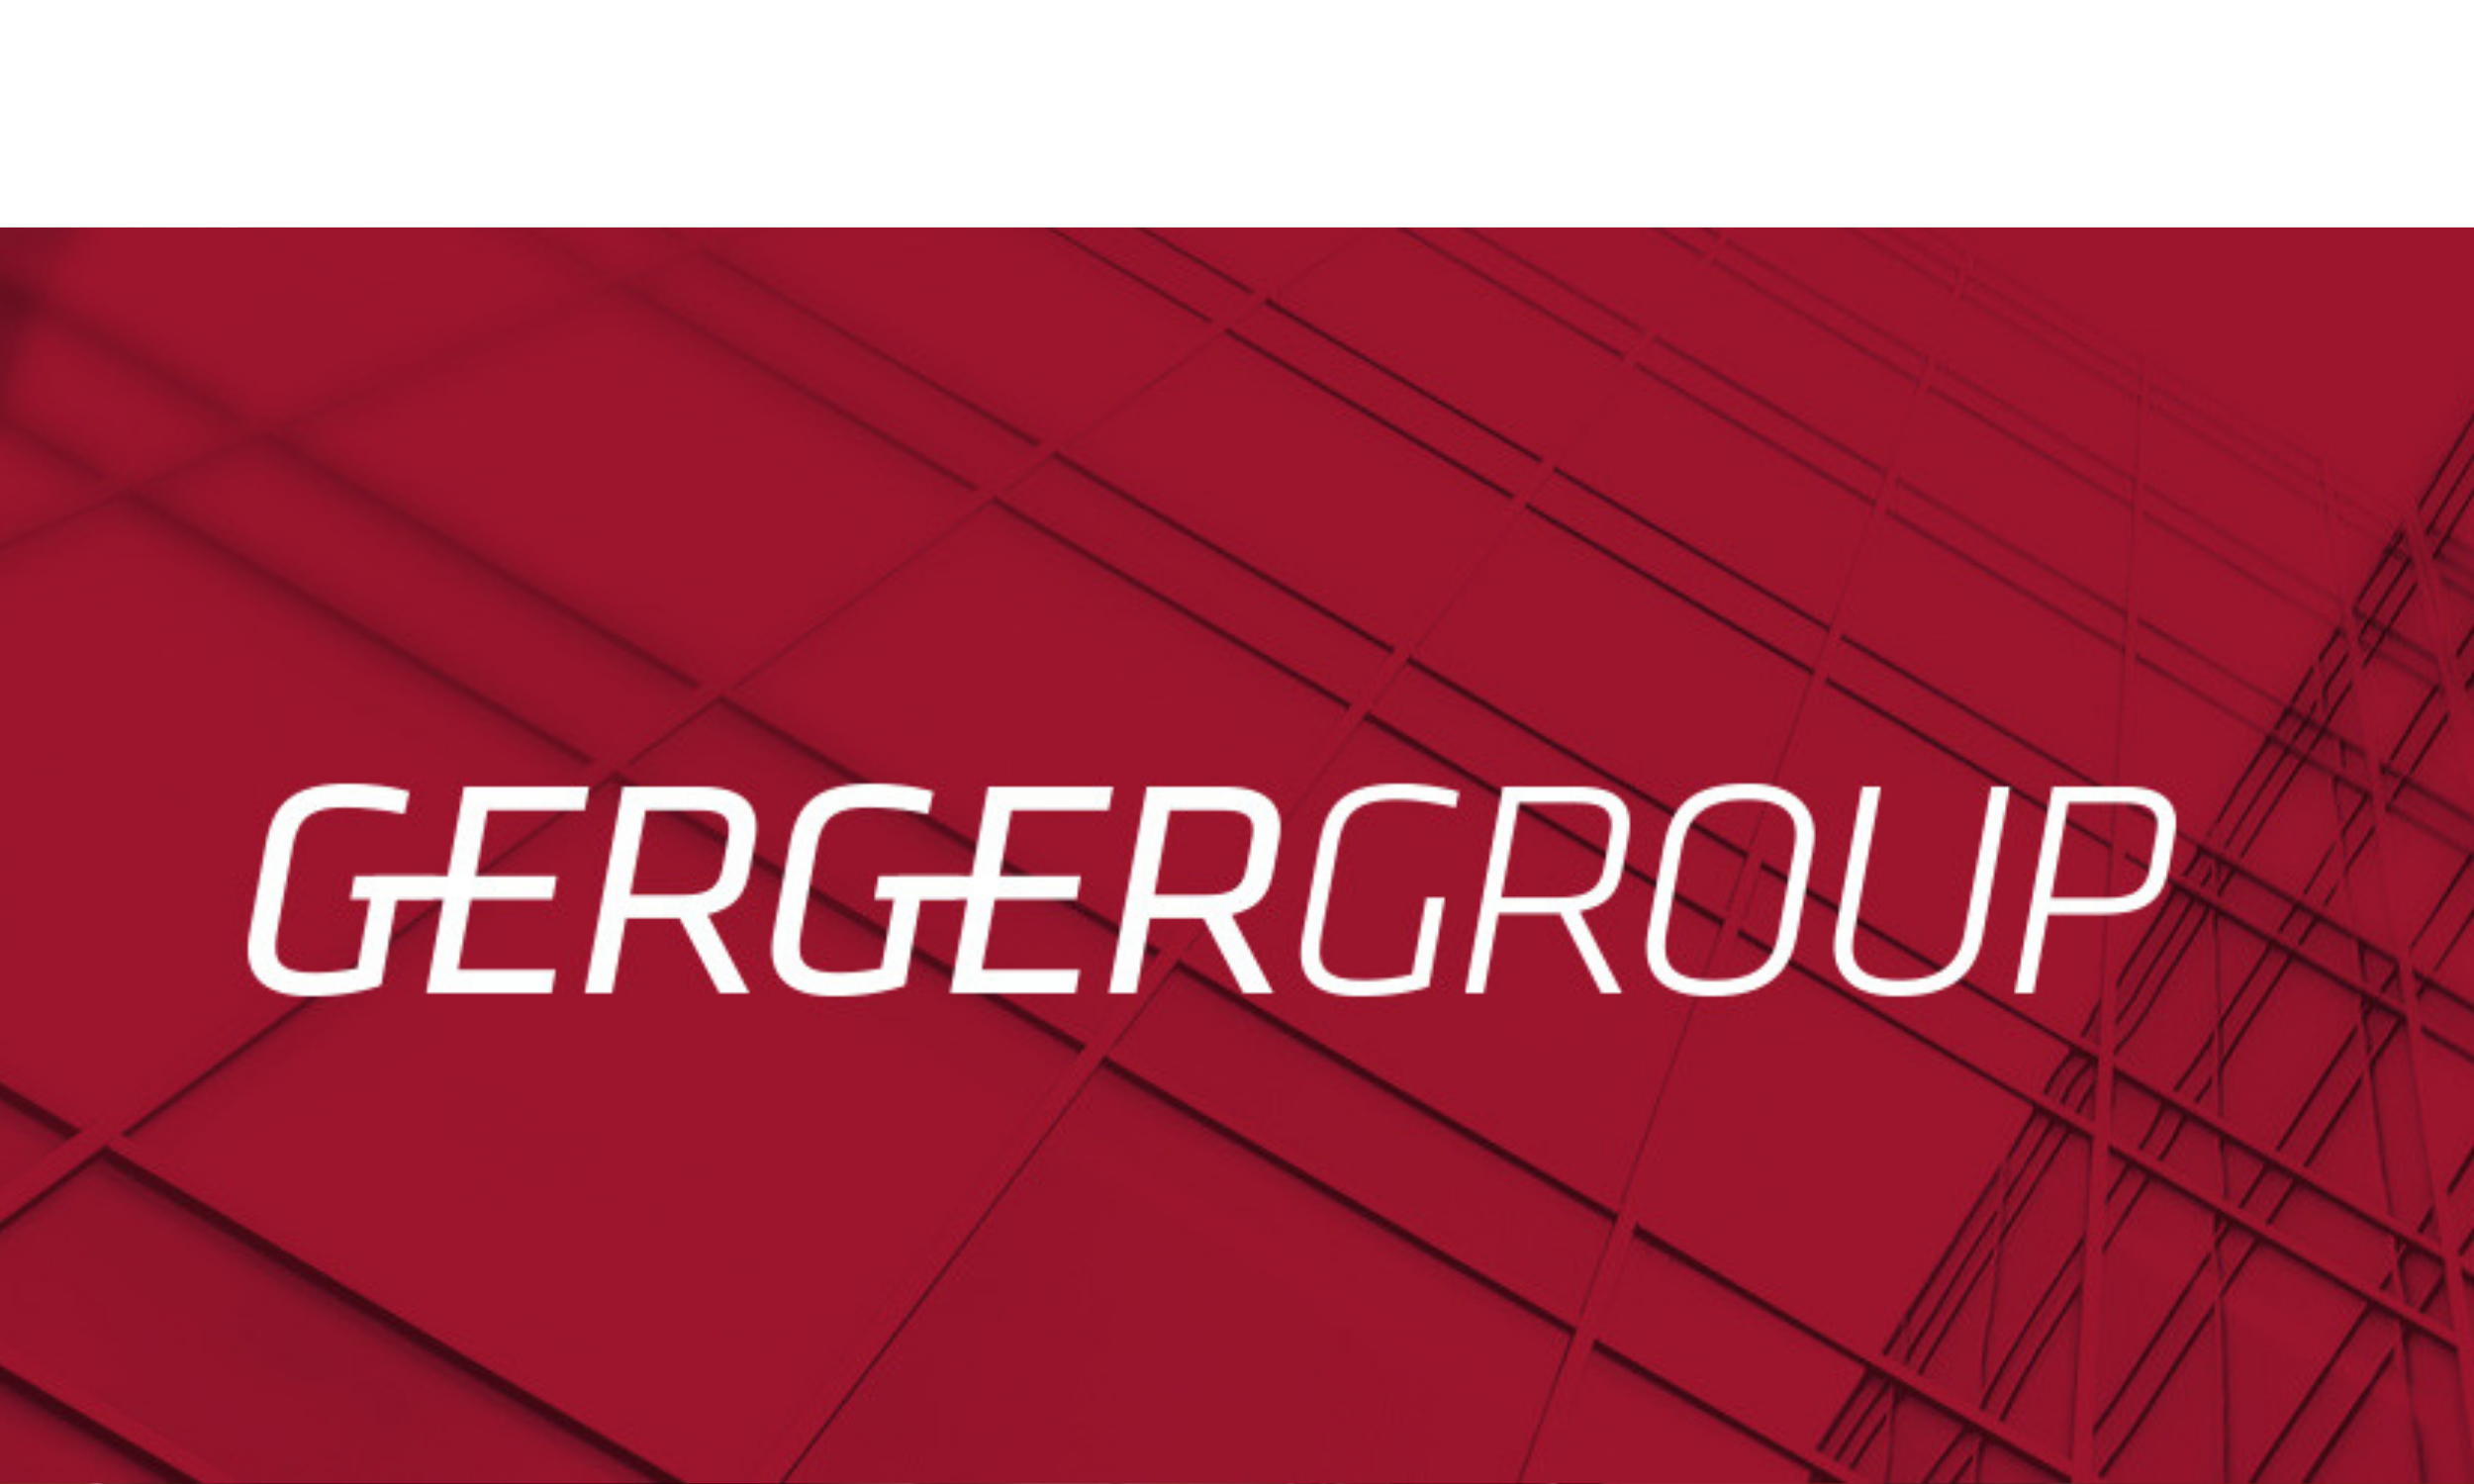 gergergroup.png